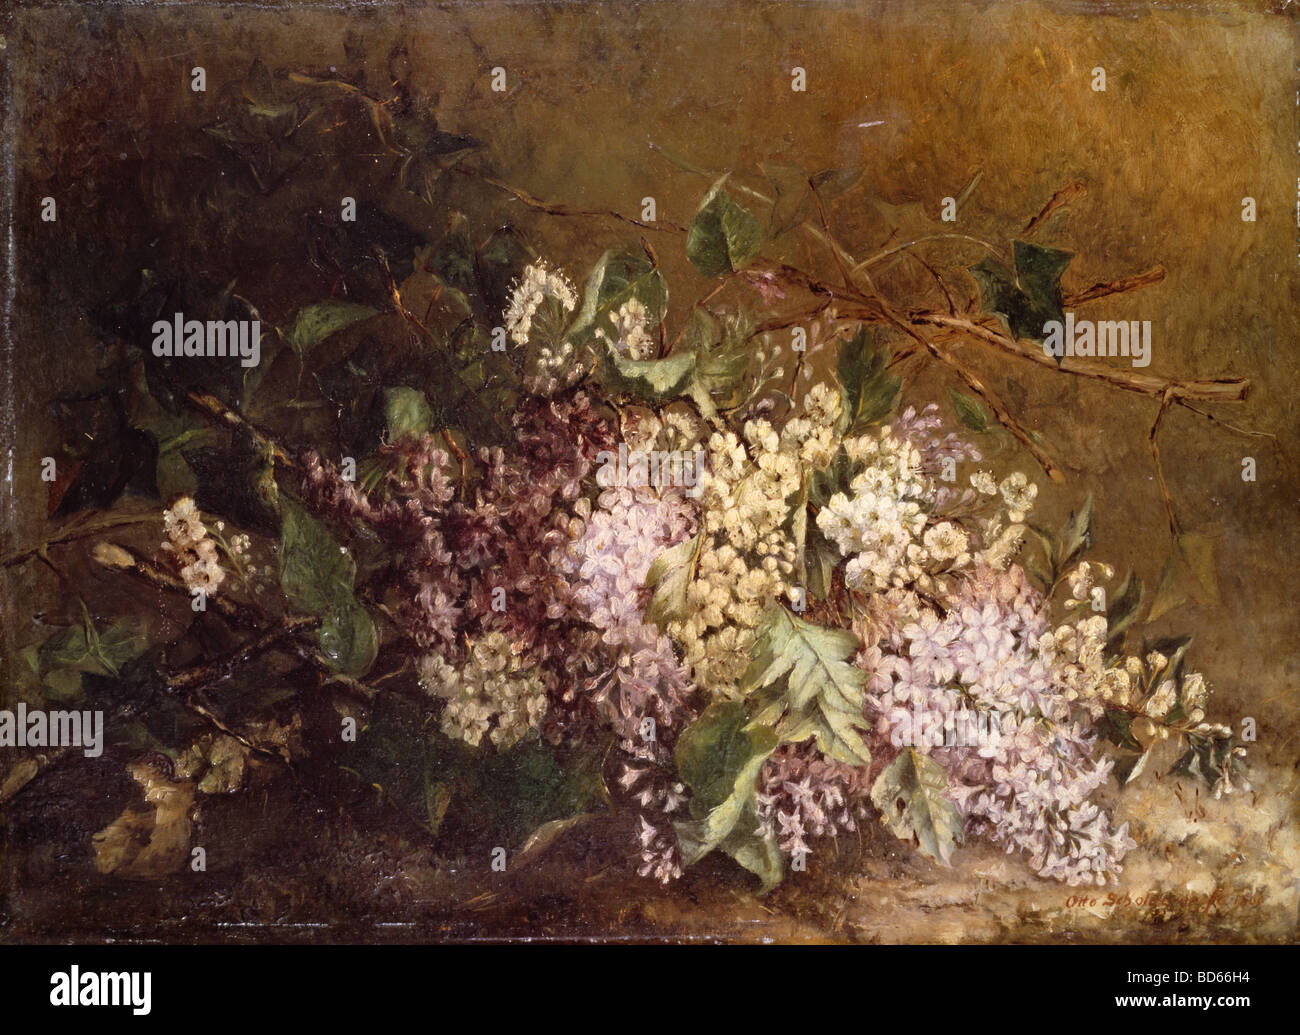 Beaux-arts, Henri Evenepoel, Otto (1834 - 1902), peinture, 'tillife avec Lilac' ('Fliederstilleben'), vers 1860, Banque D'Images